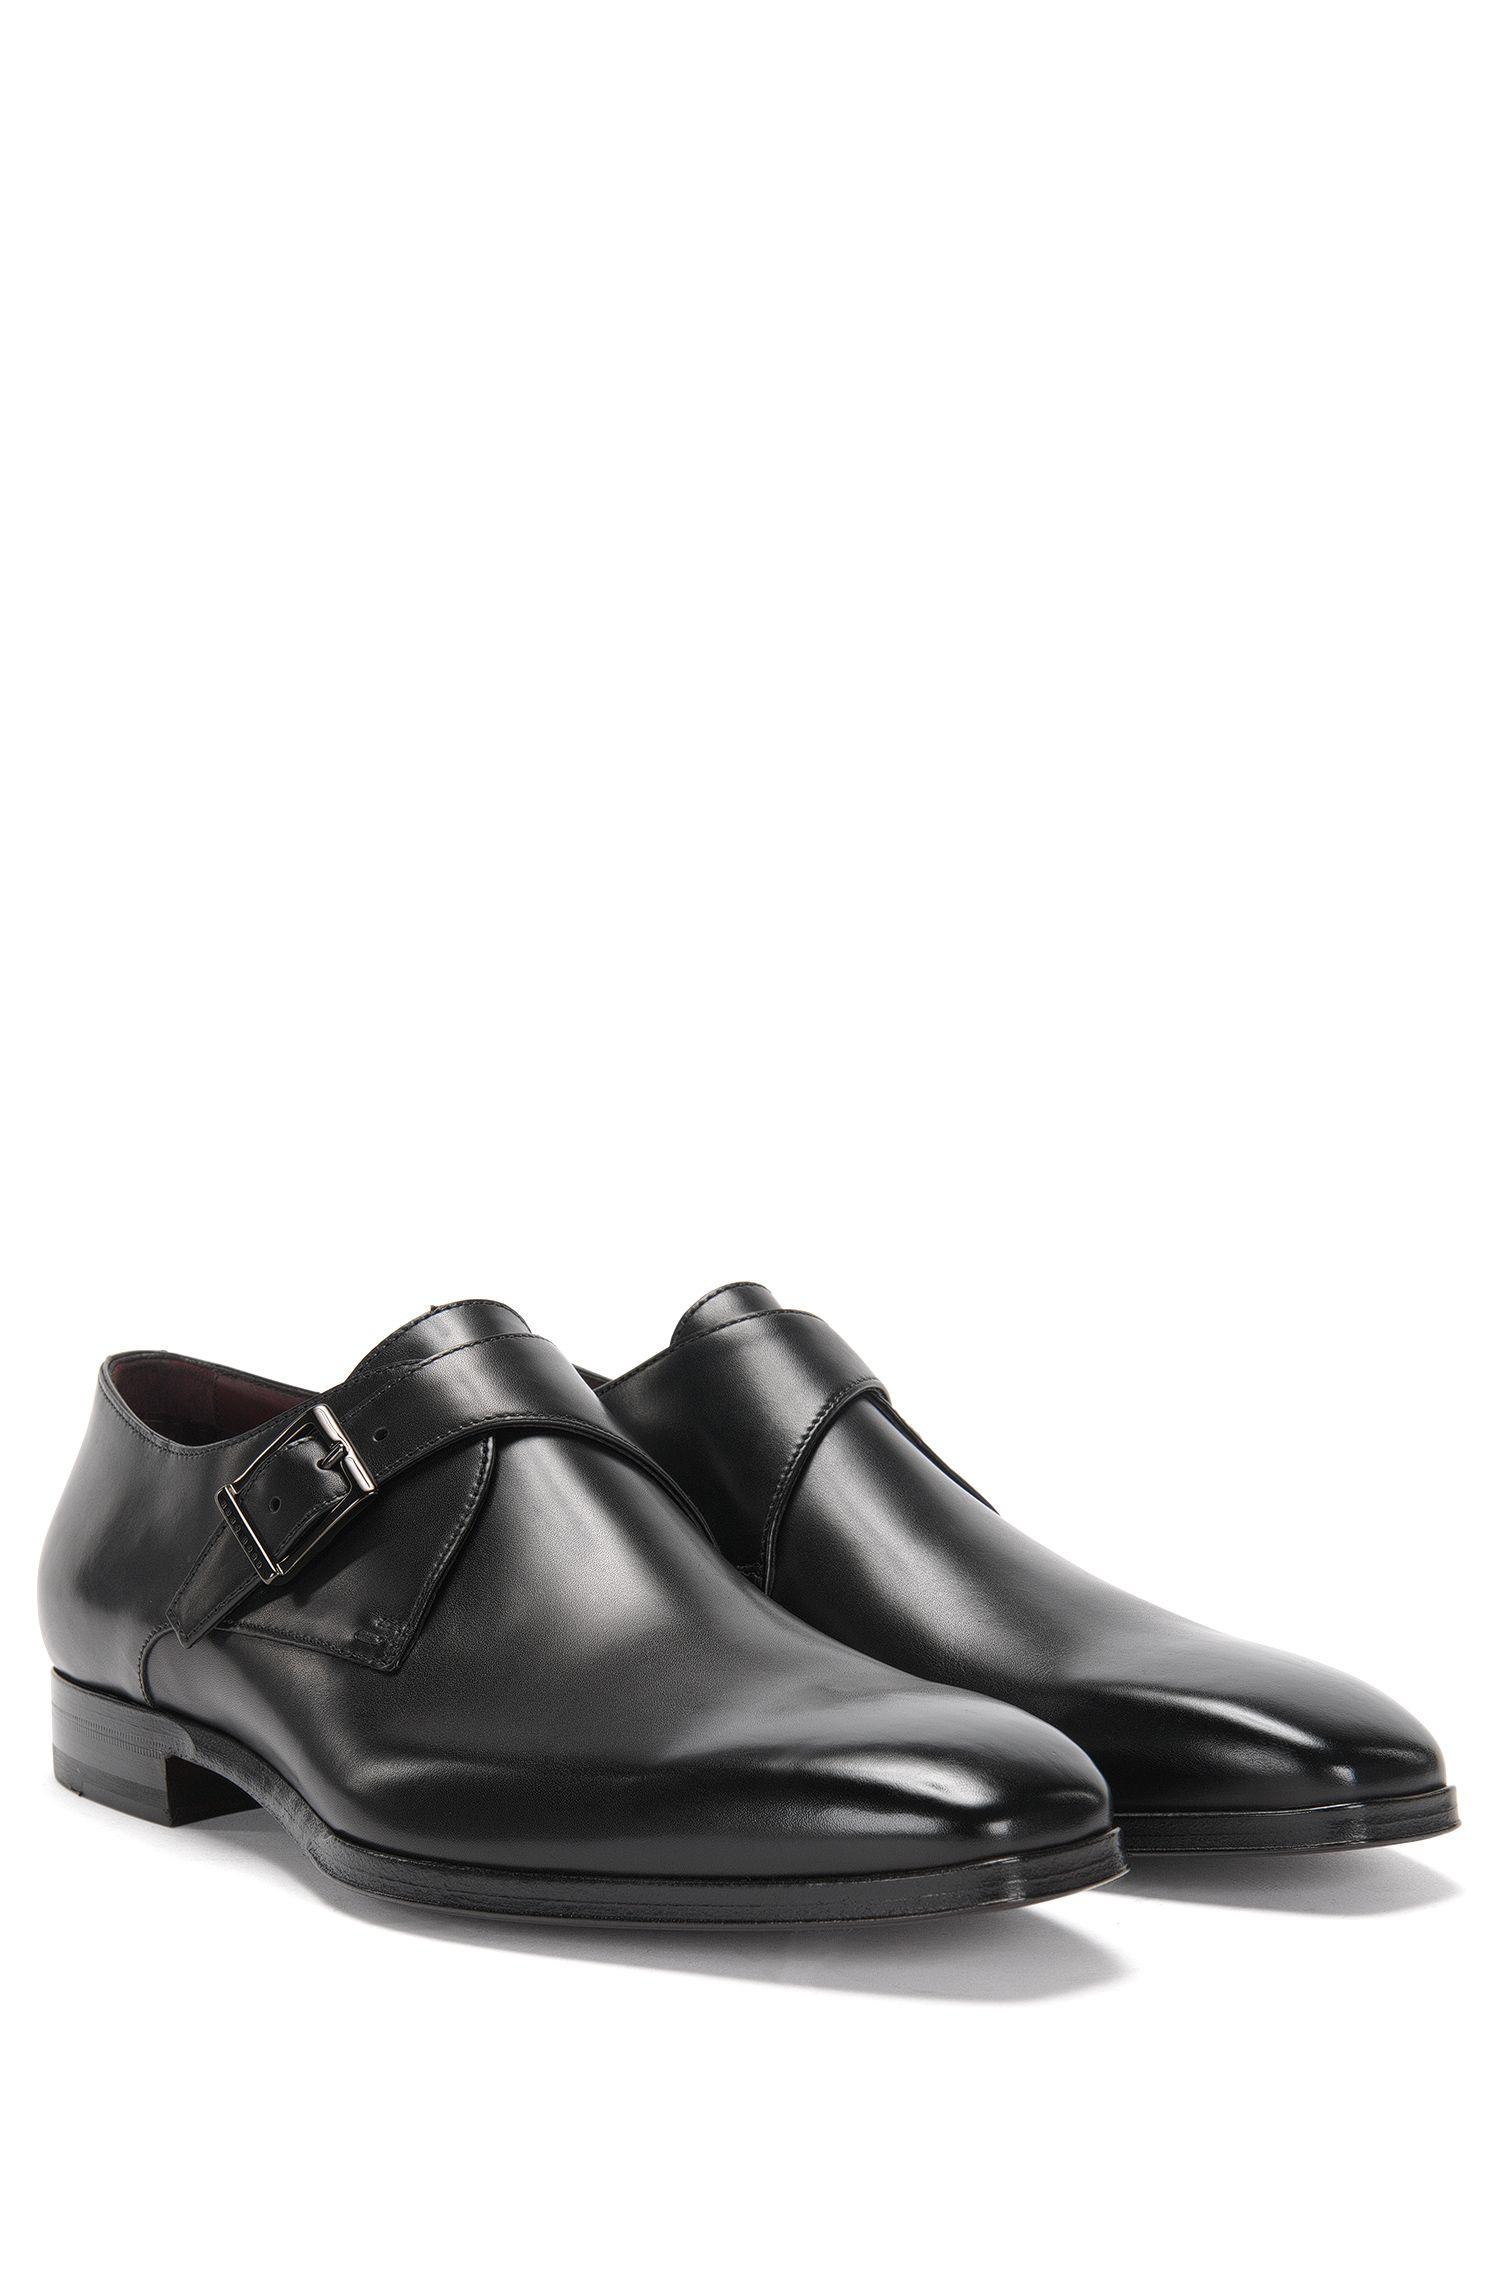 'T-Club Monk Itpt' | Italian Calfskin Monk Strap Dress Shoes